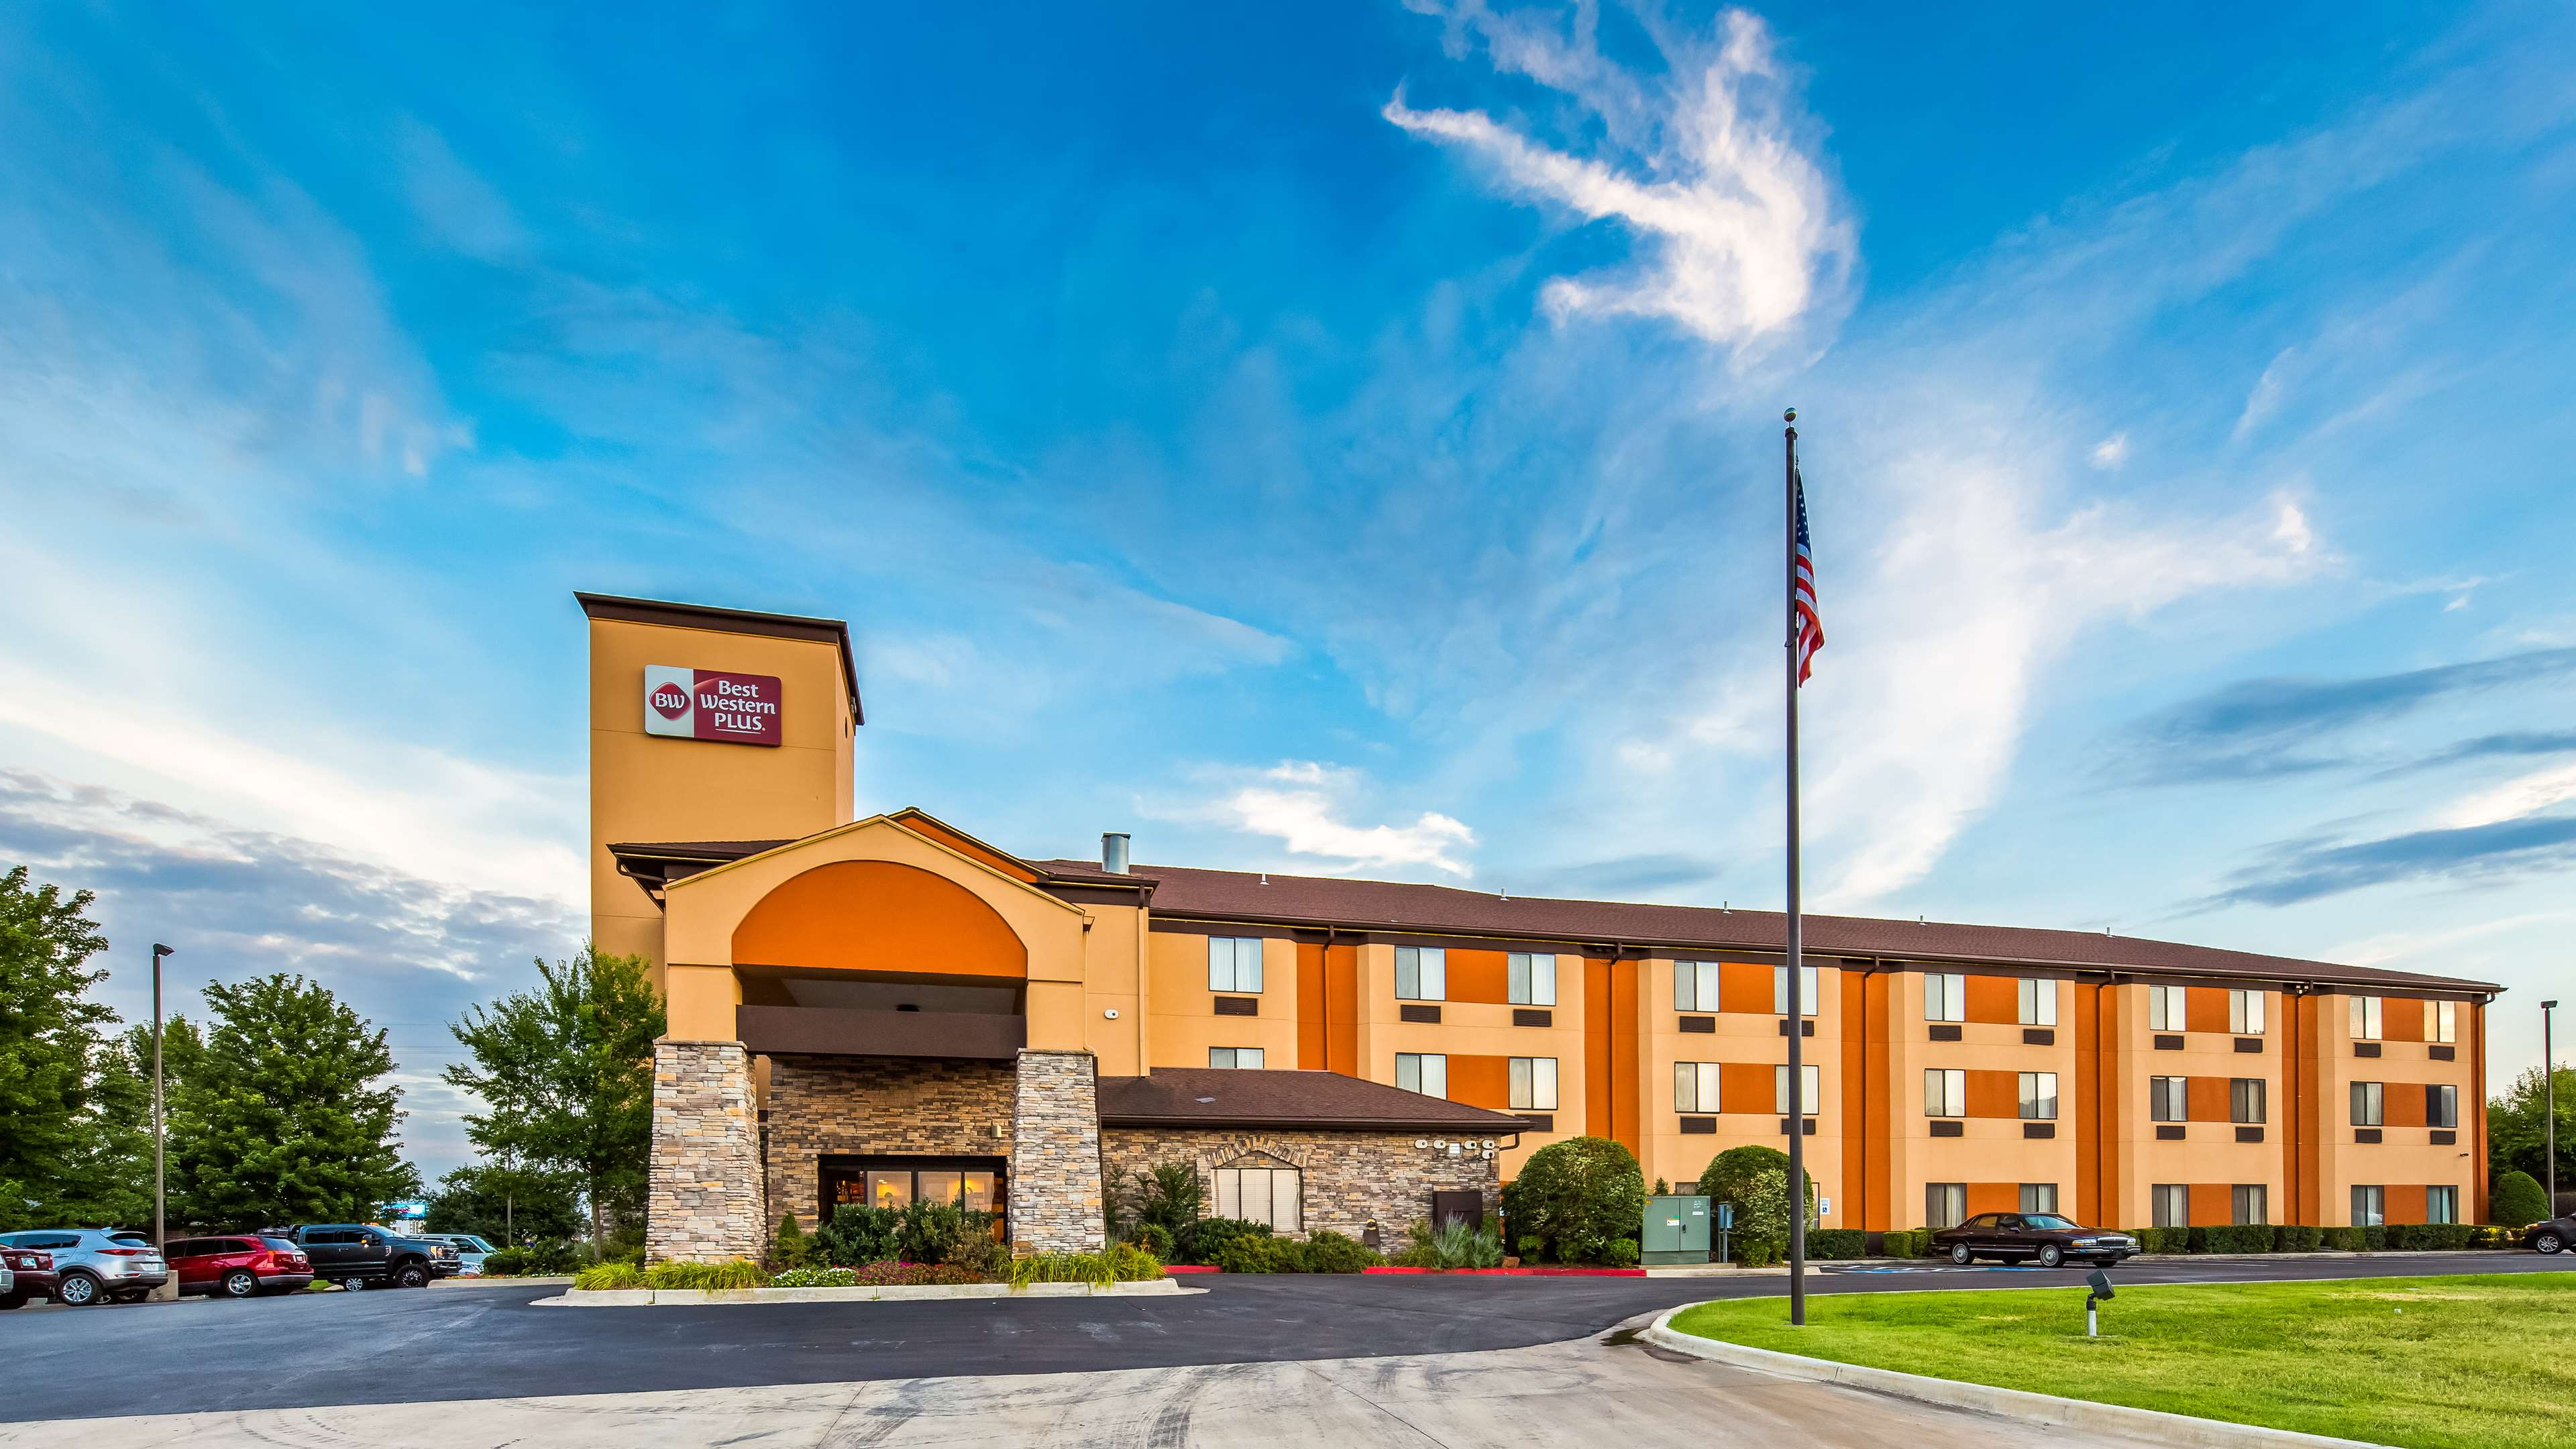 Best Western Plus Woodland Hills Hotel & Suites image 1